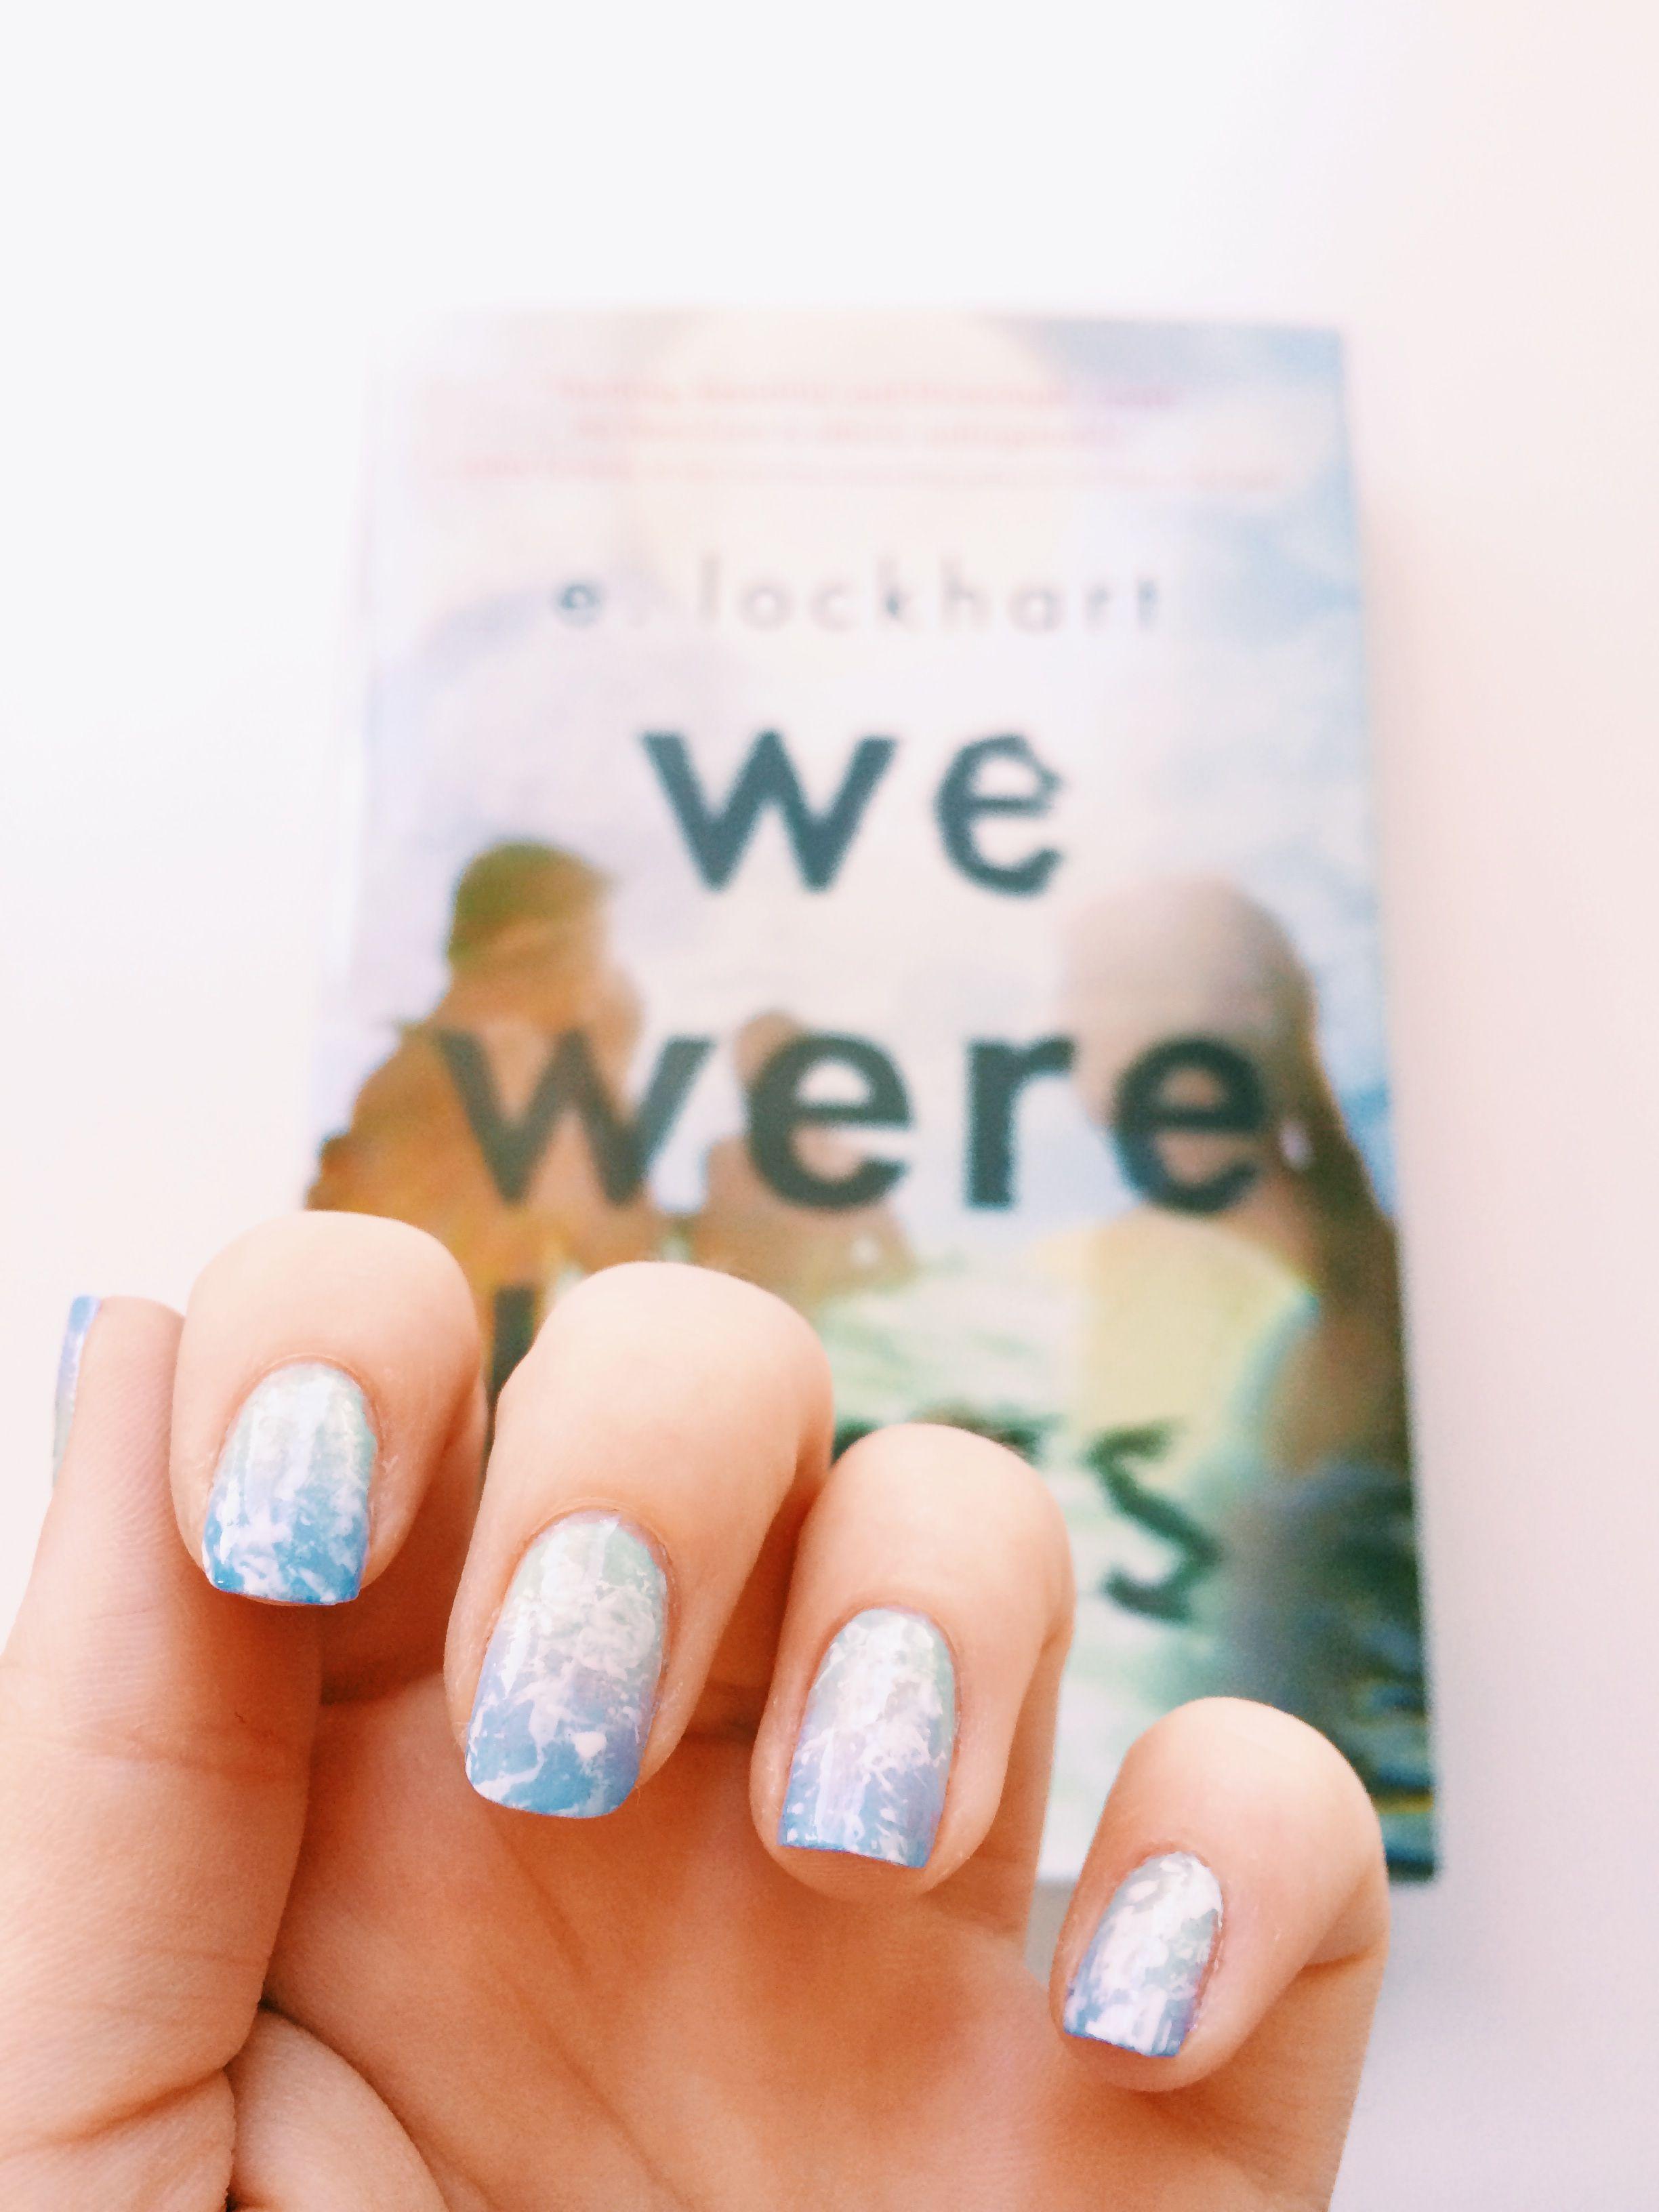 Liar liar polish on fire manicure nails nail art